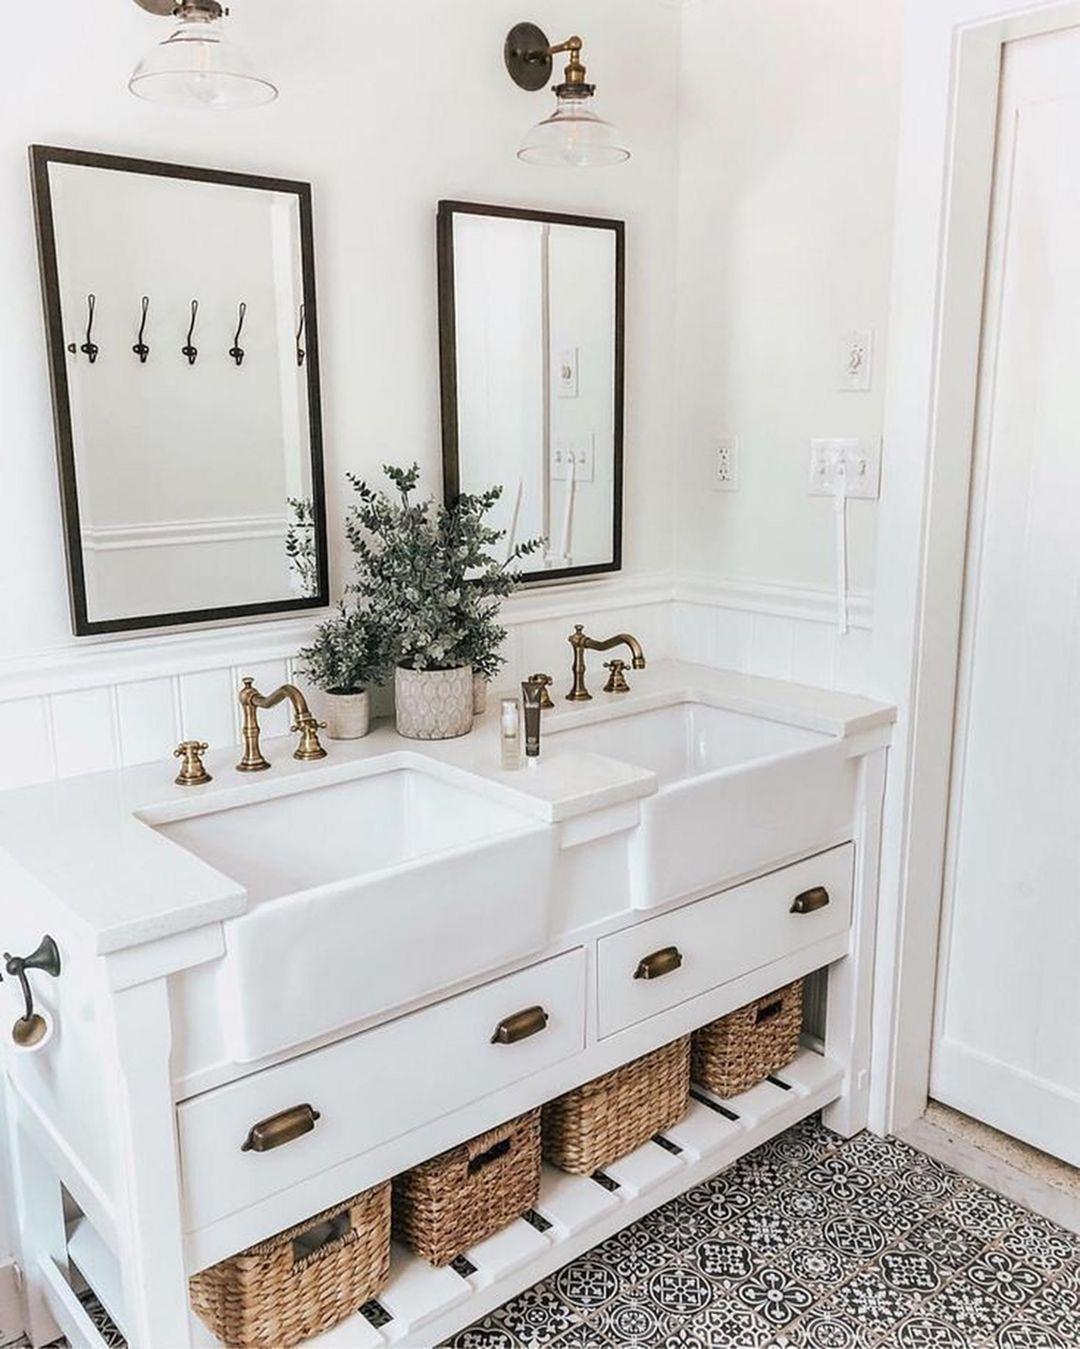 15 Fabulous Farmhouse Bathroom Design And Decor For Remodel Ideas